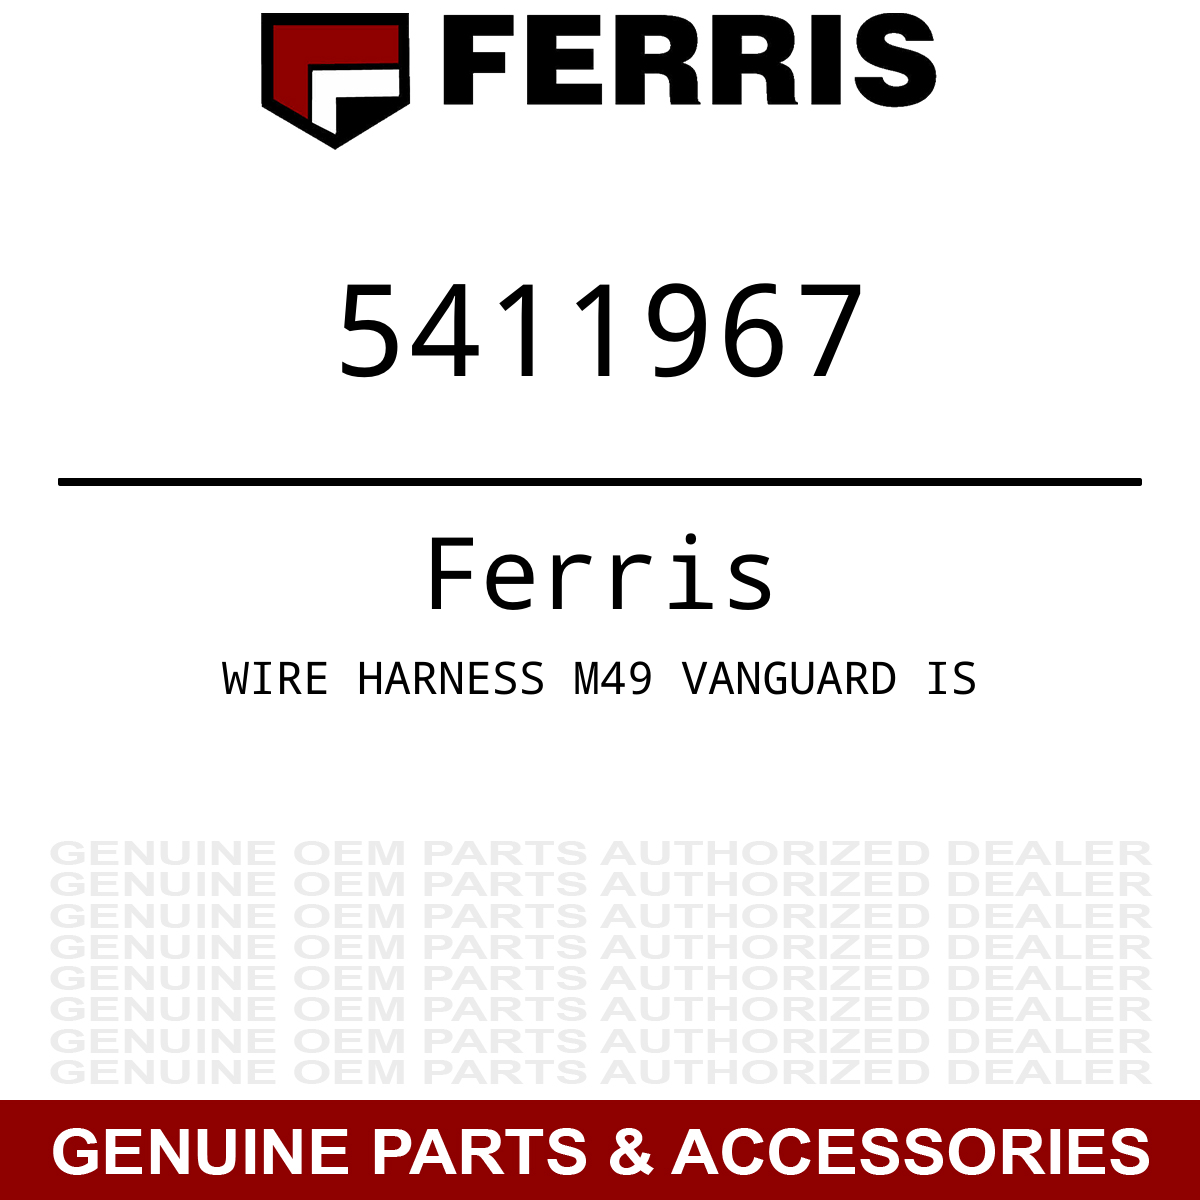 Genuine Ferris WIRE HARNESS M49 VANGUARD IS Part# 5411967